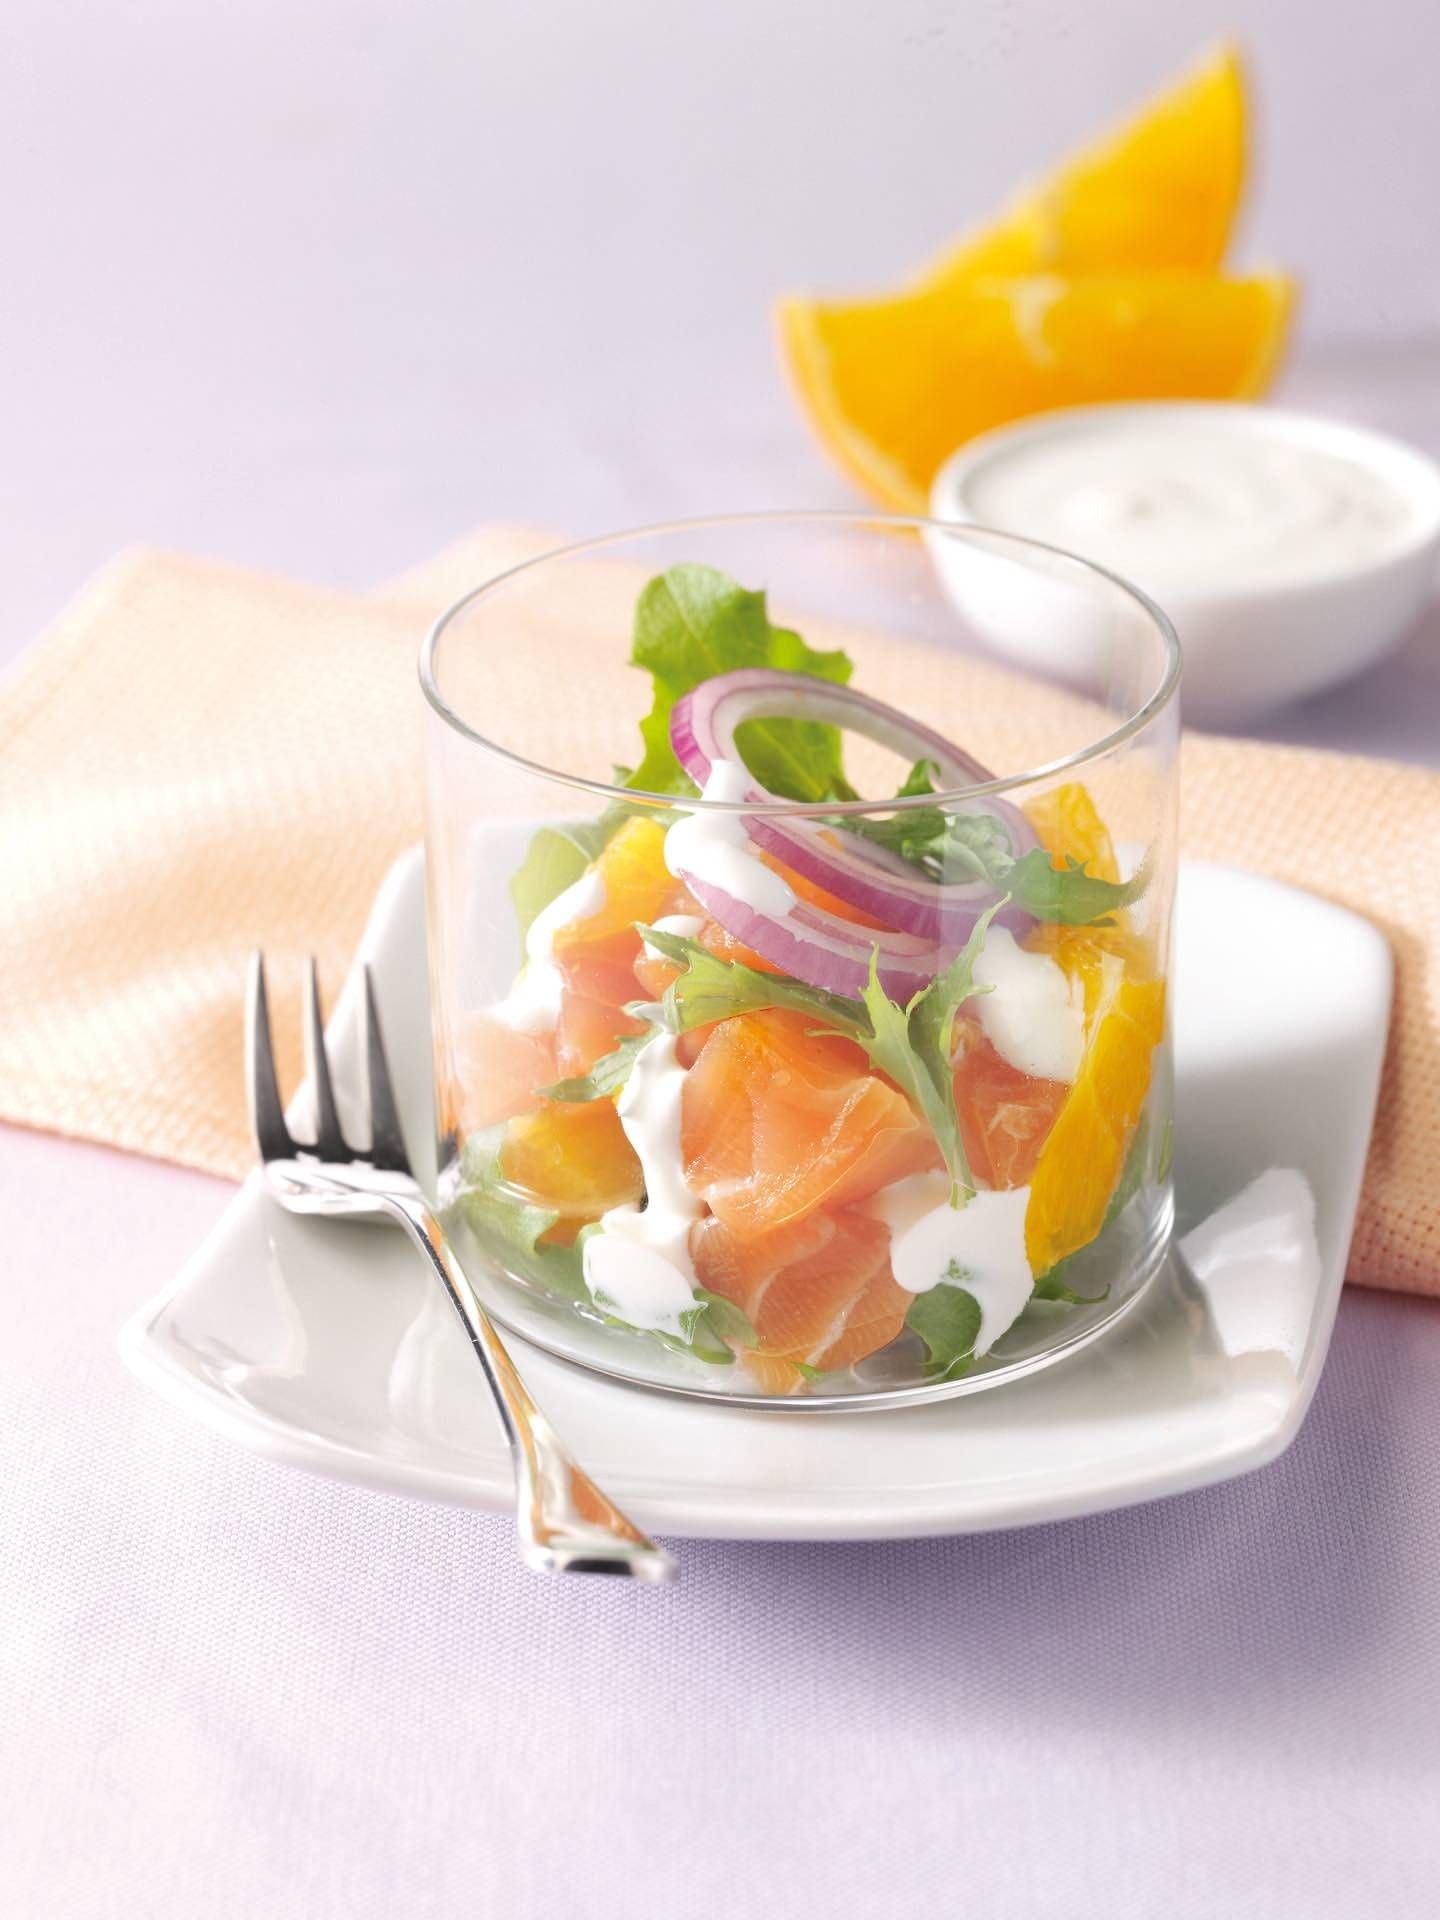 Salmone marinato agli agrumi - Parmalat